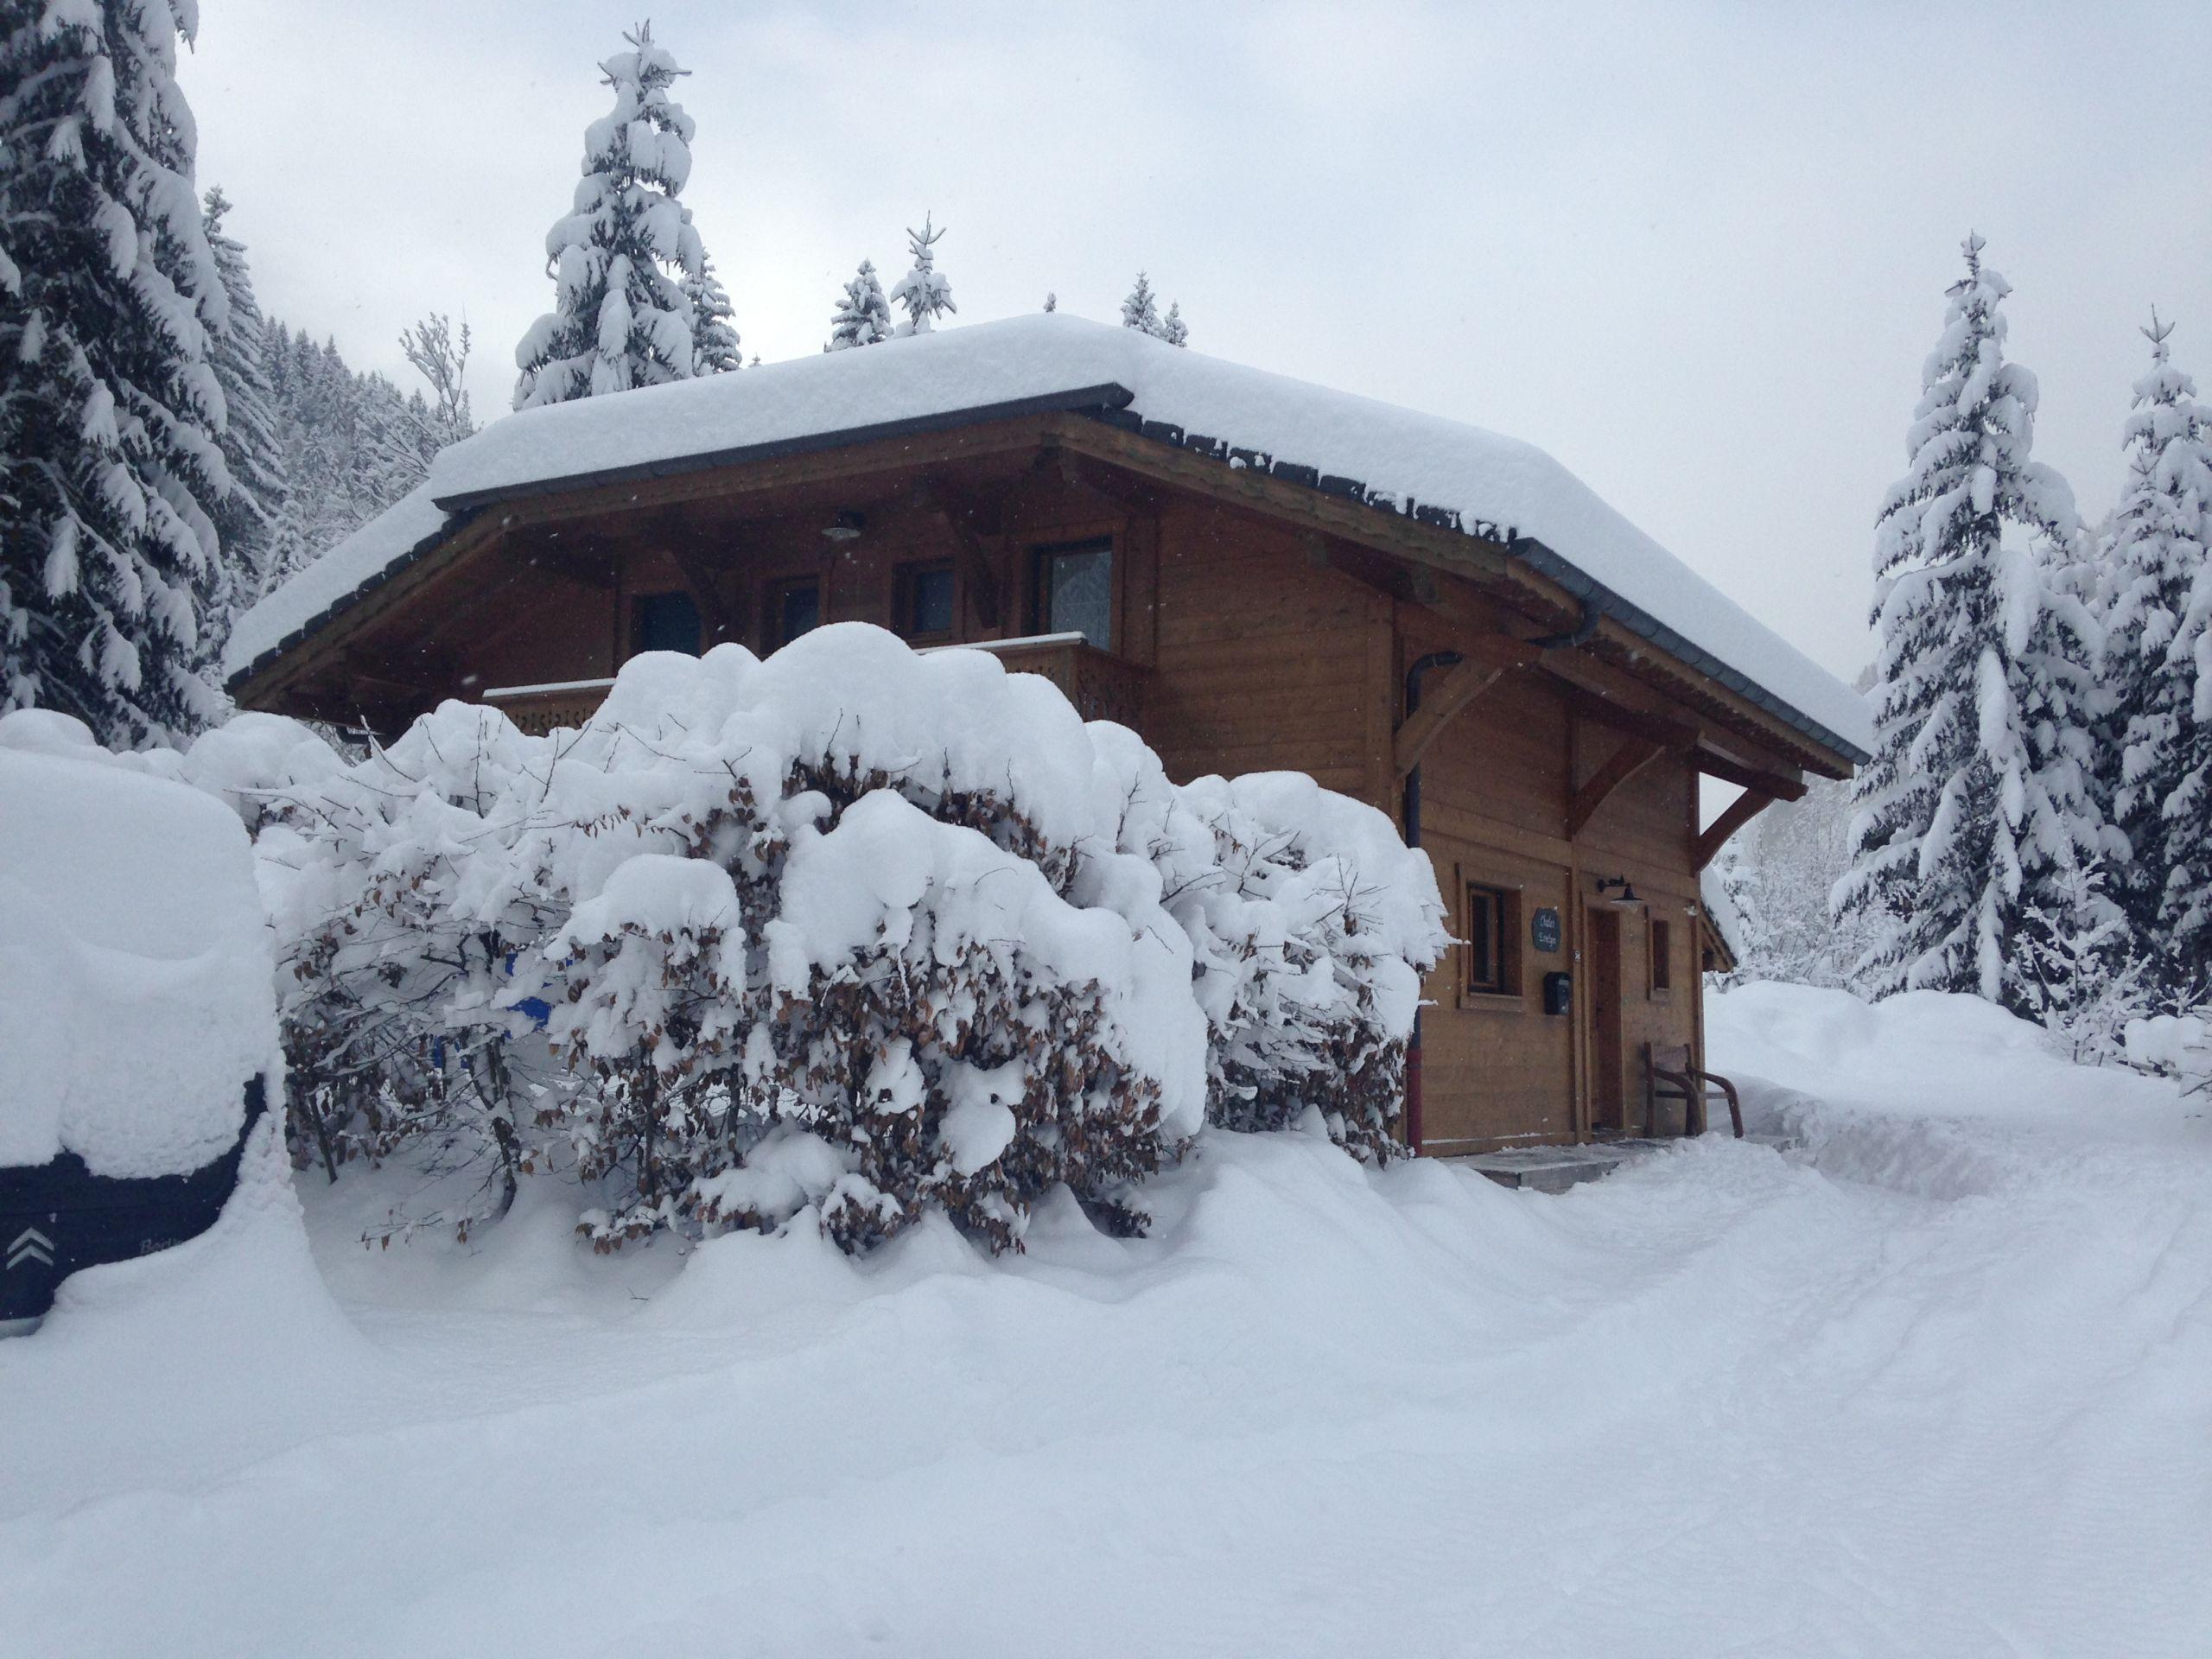 Chalet in winter